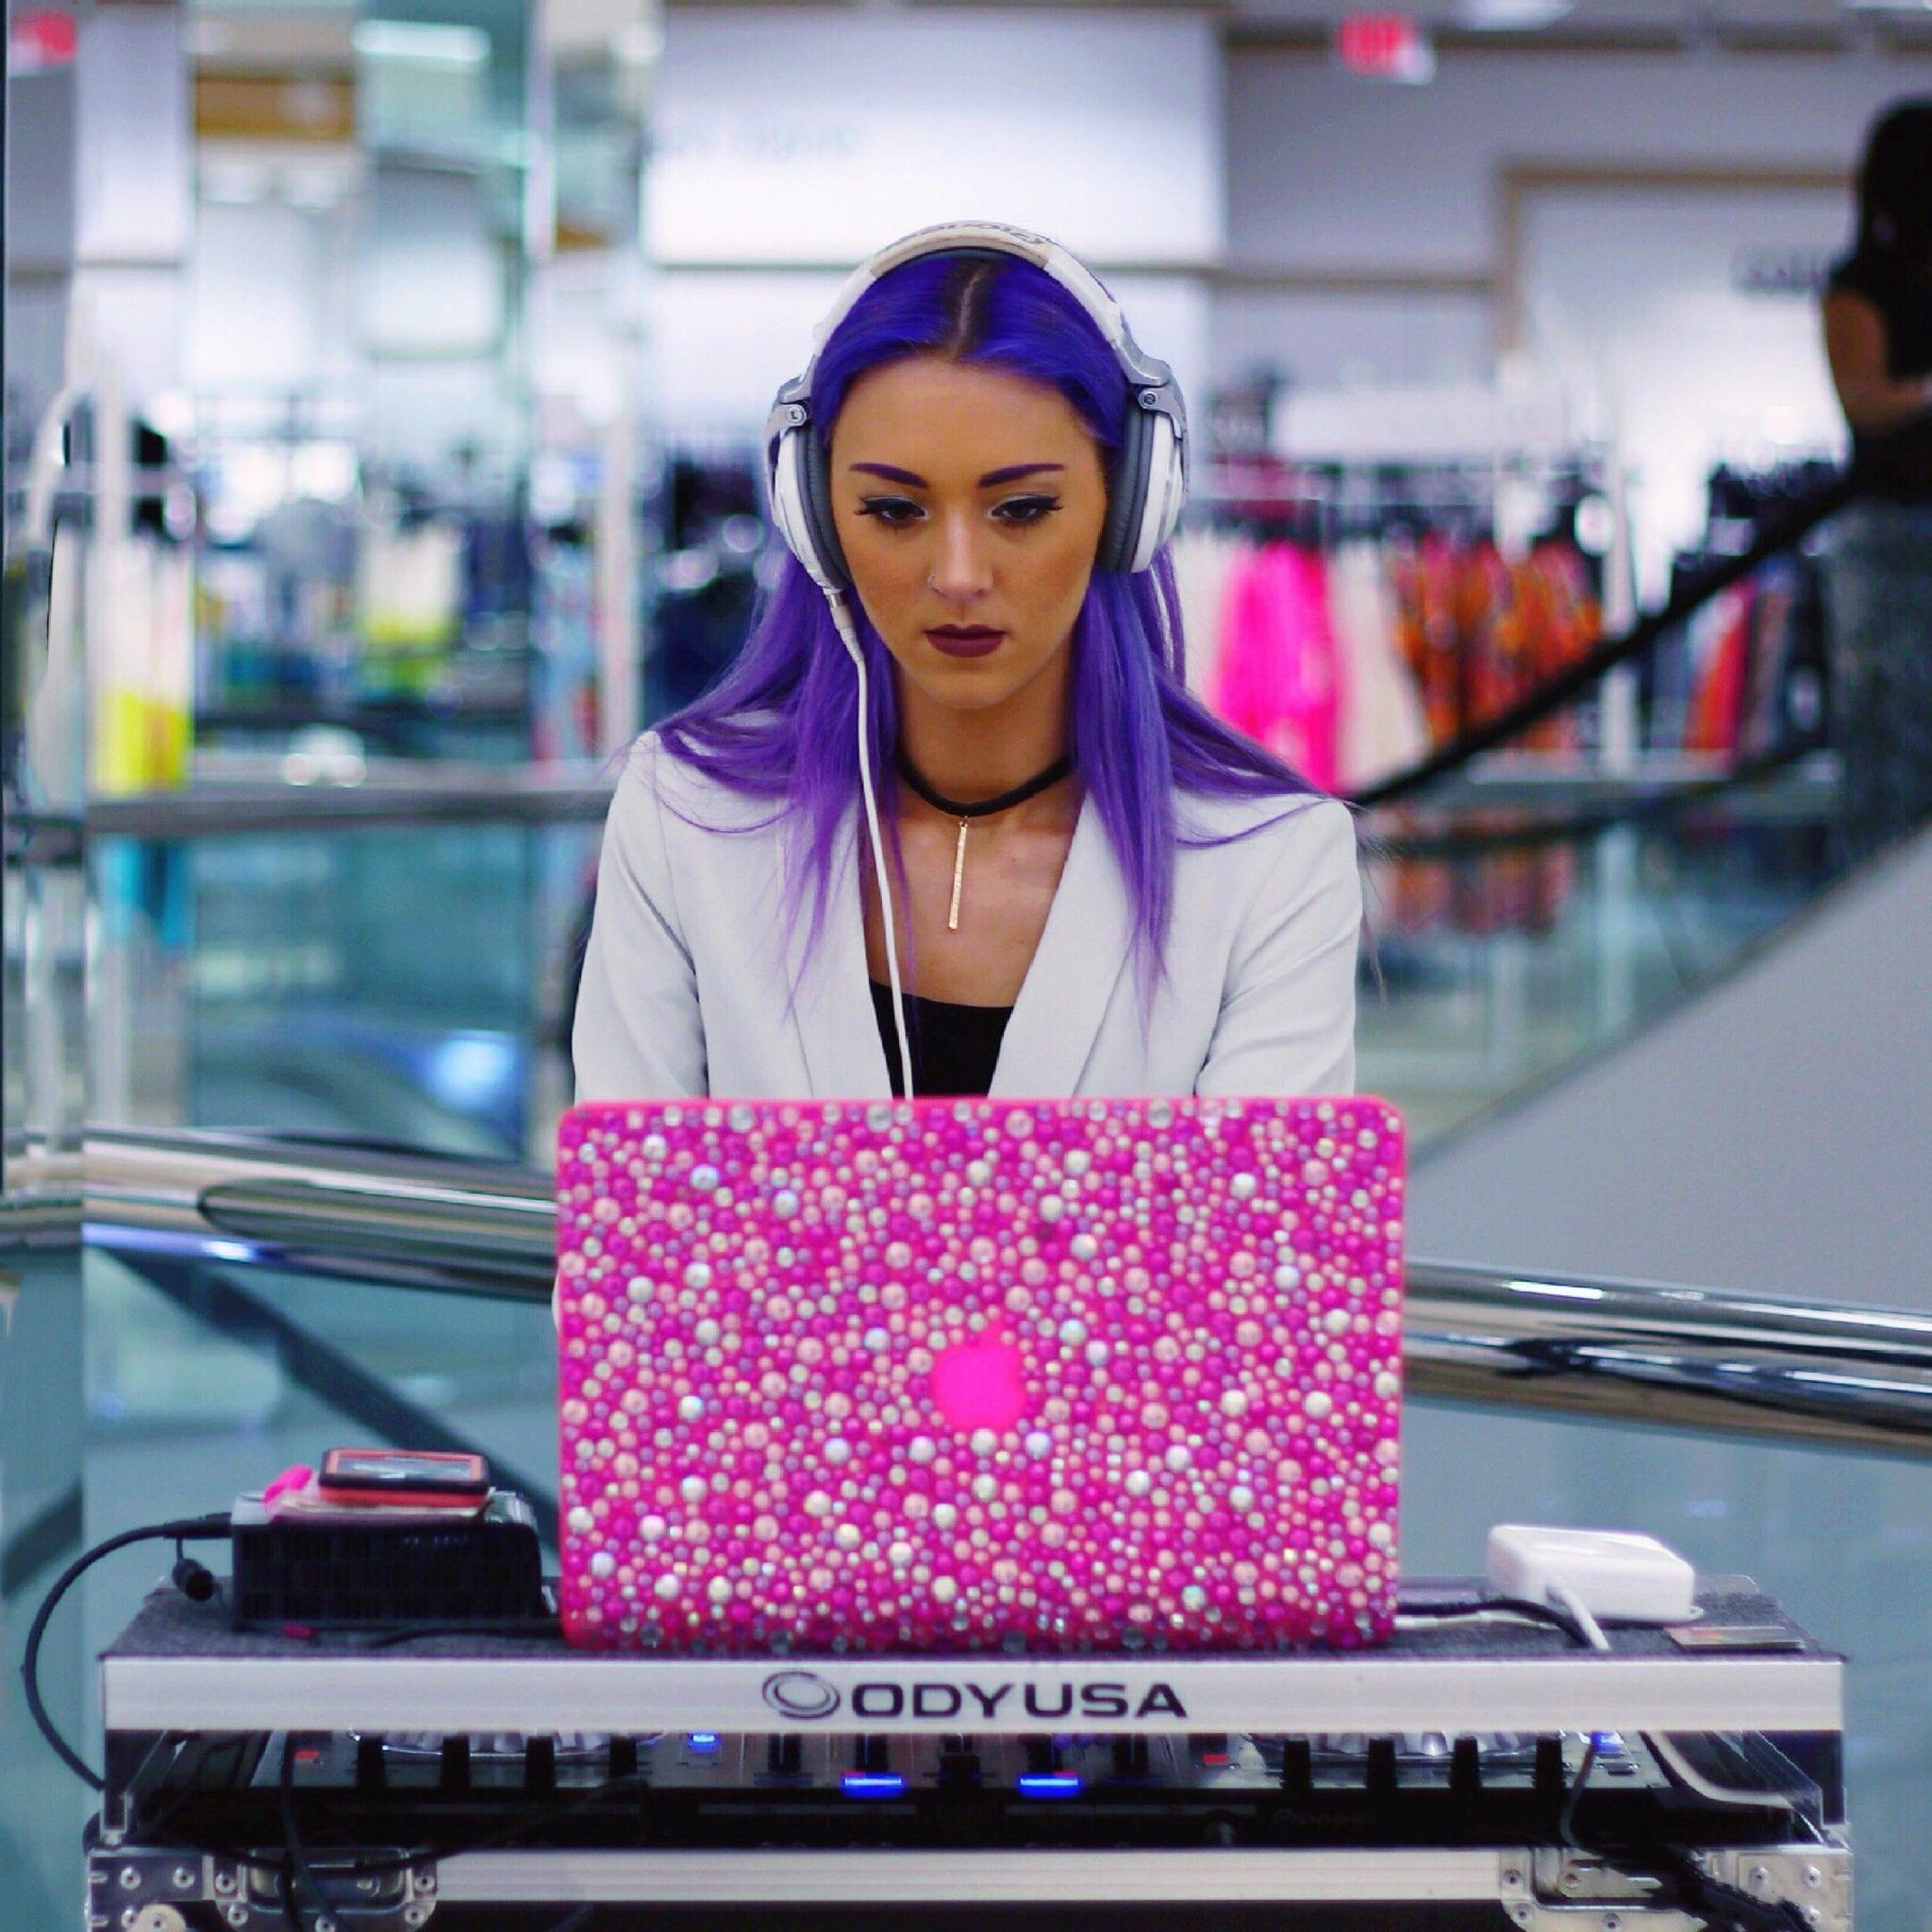 DJ Chelli at a pink laptop.